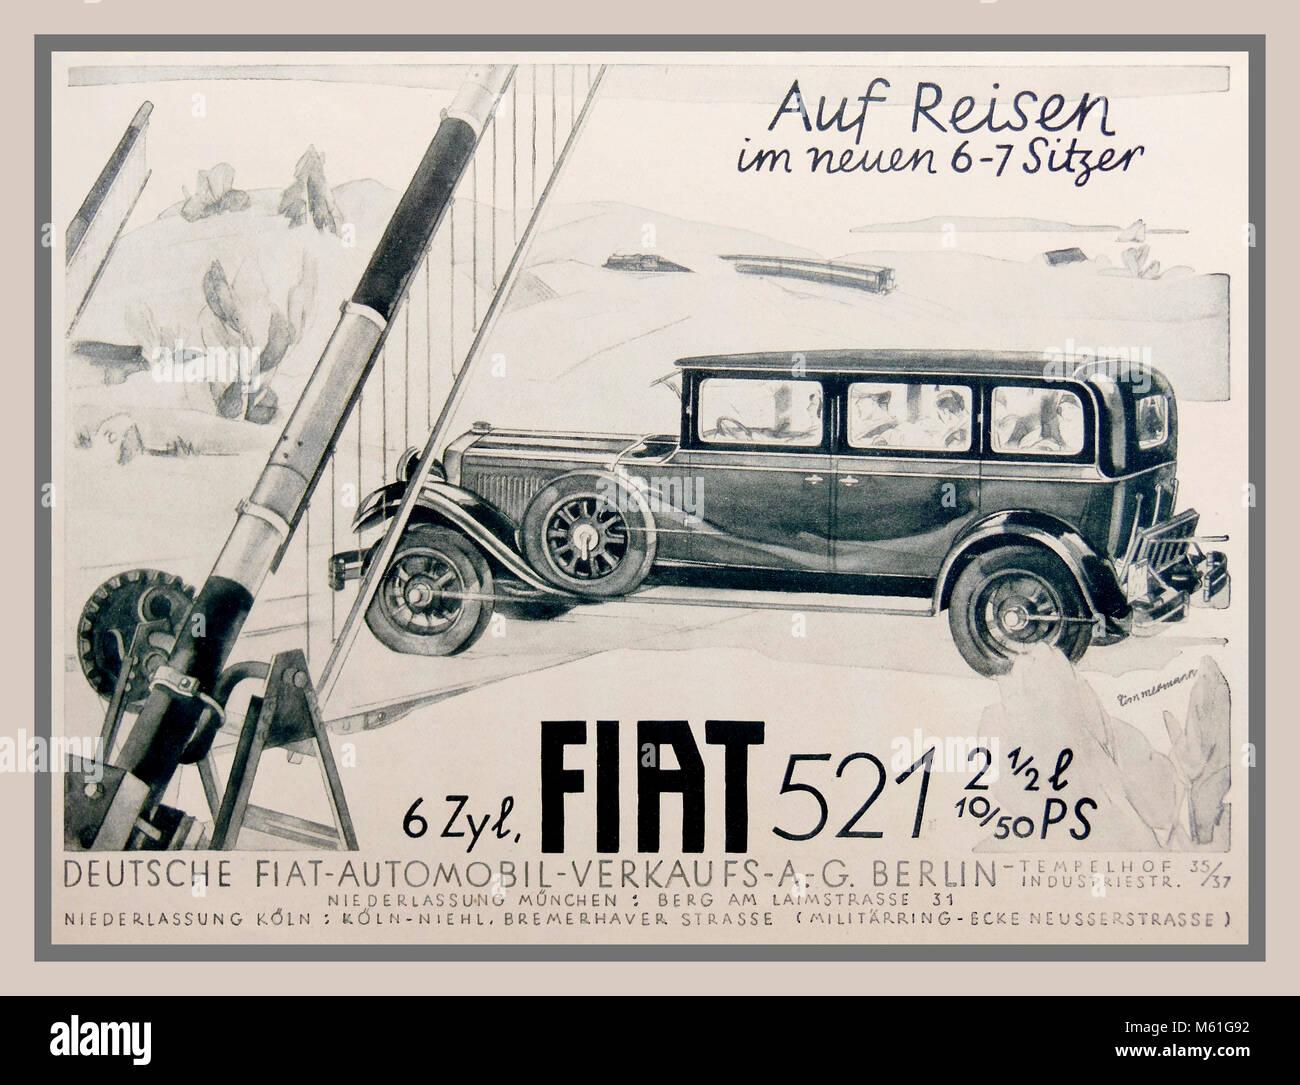 Car Advertising Stock Photos & Car Advertising Stock Images - Alamy